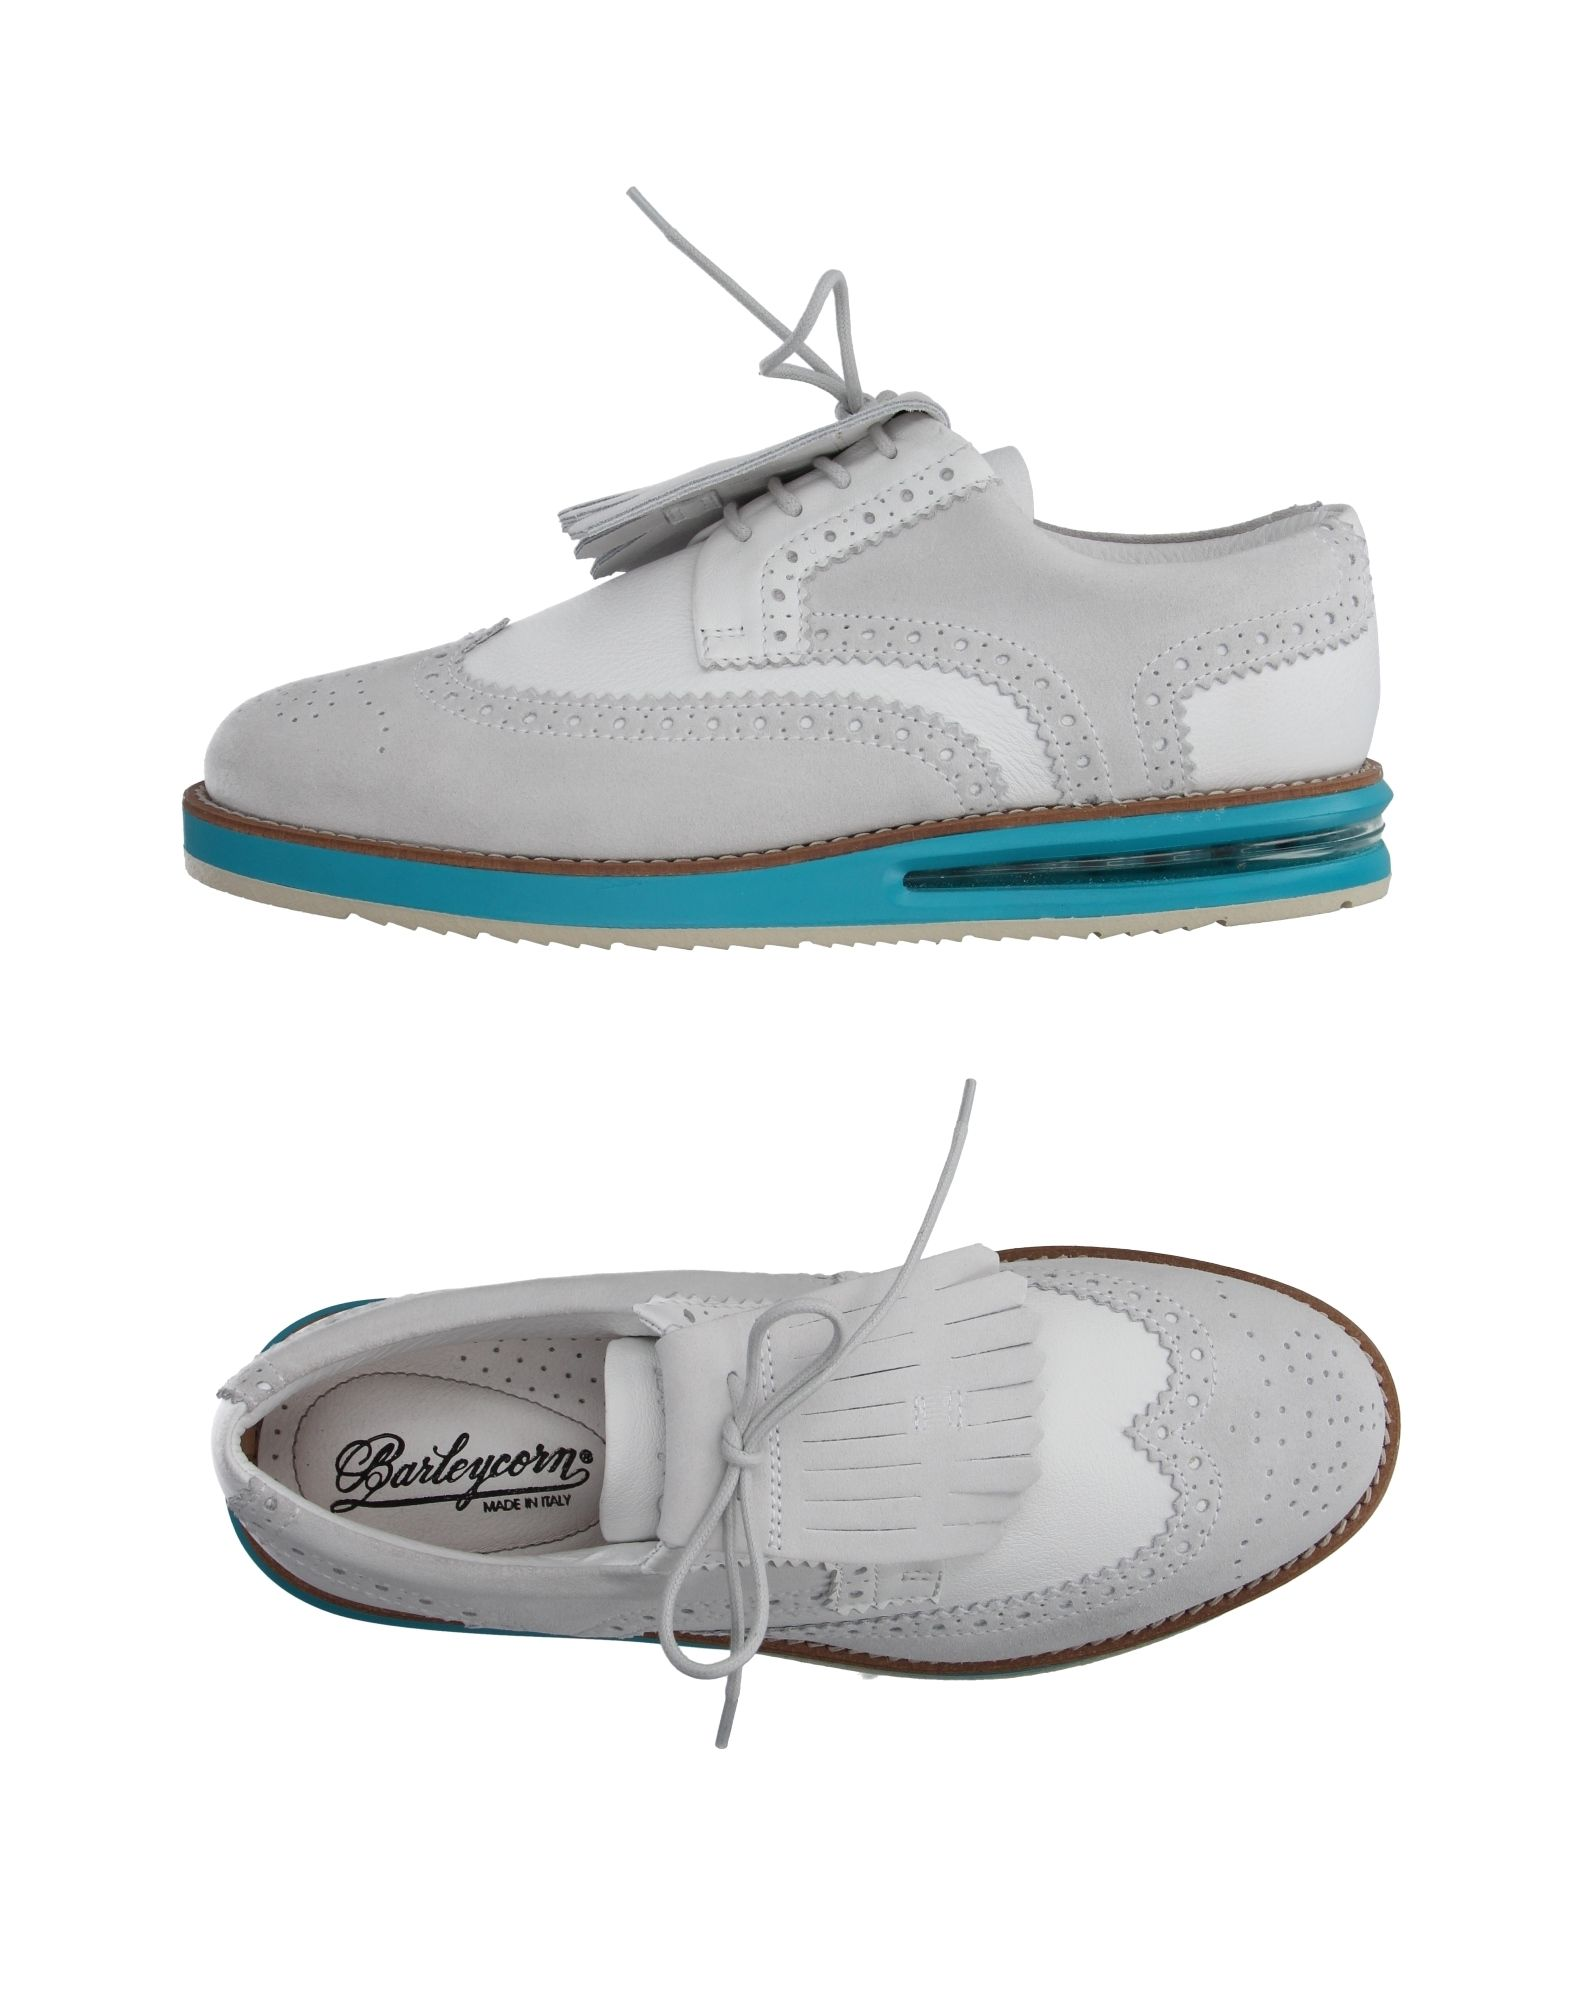 Barleycorn Schnürschuhe Herren  11070943CT Heiße Schuhe a26cc5